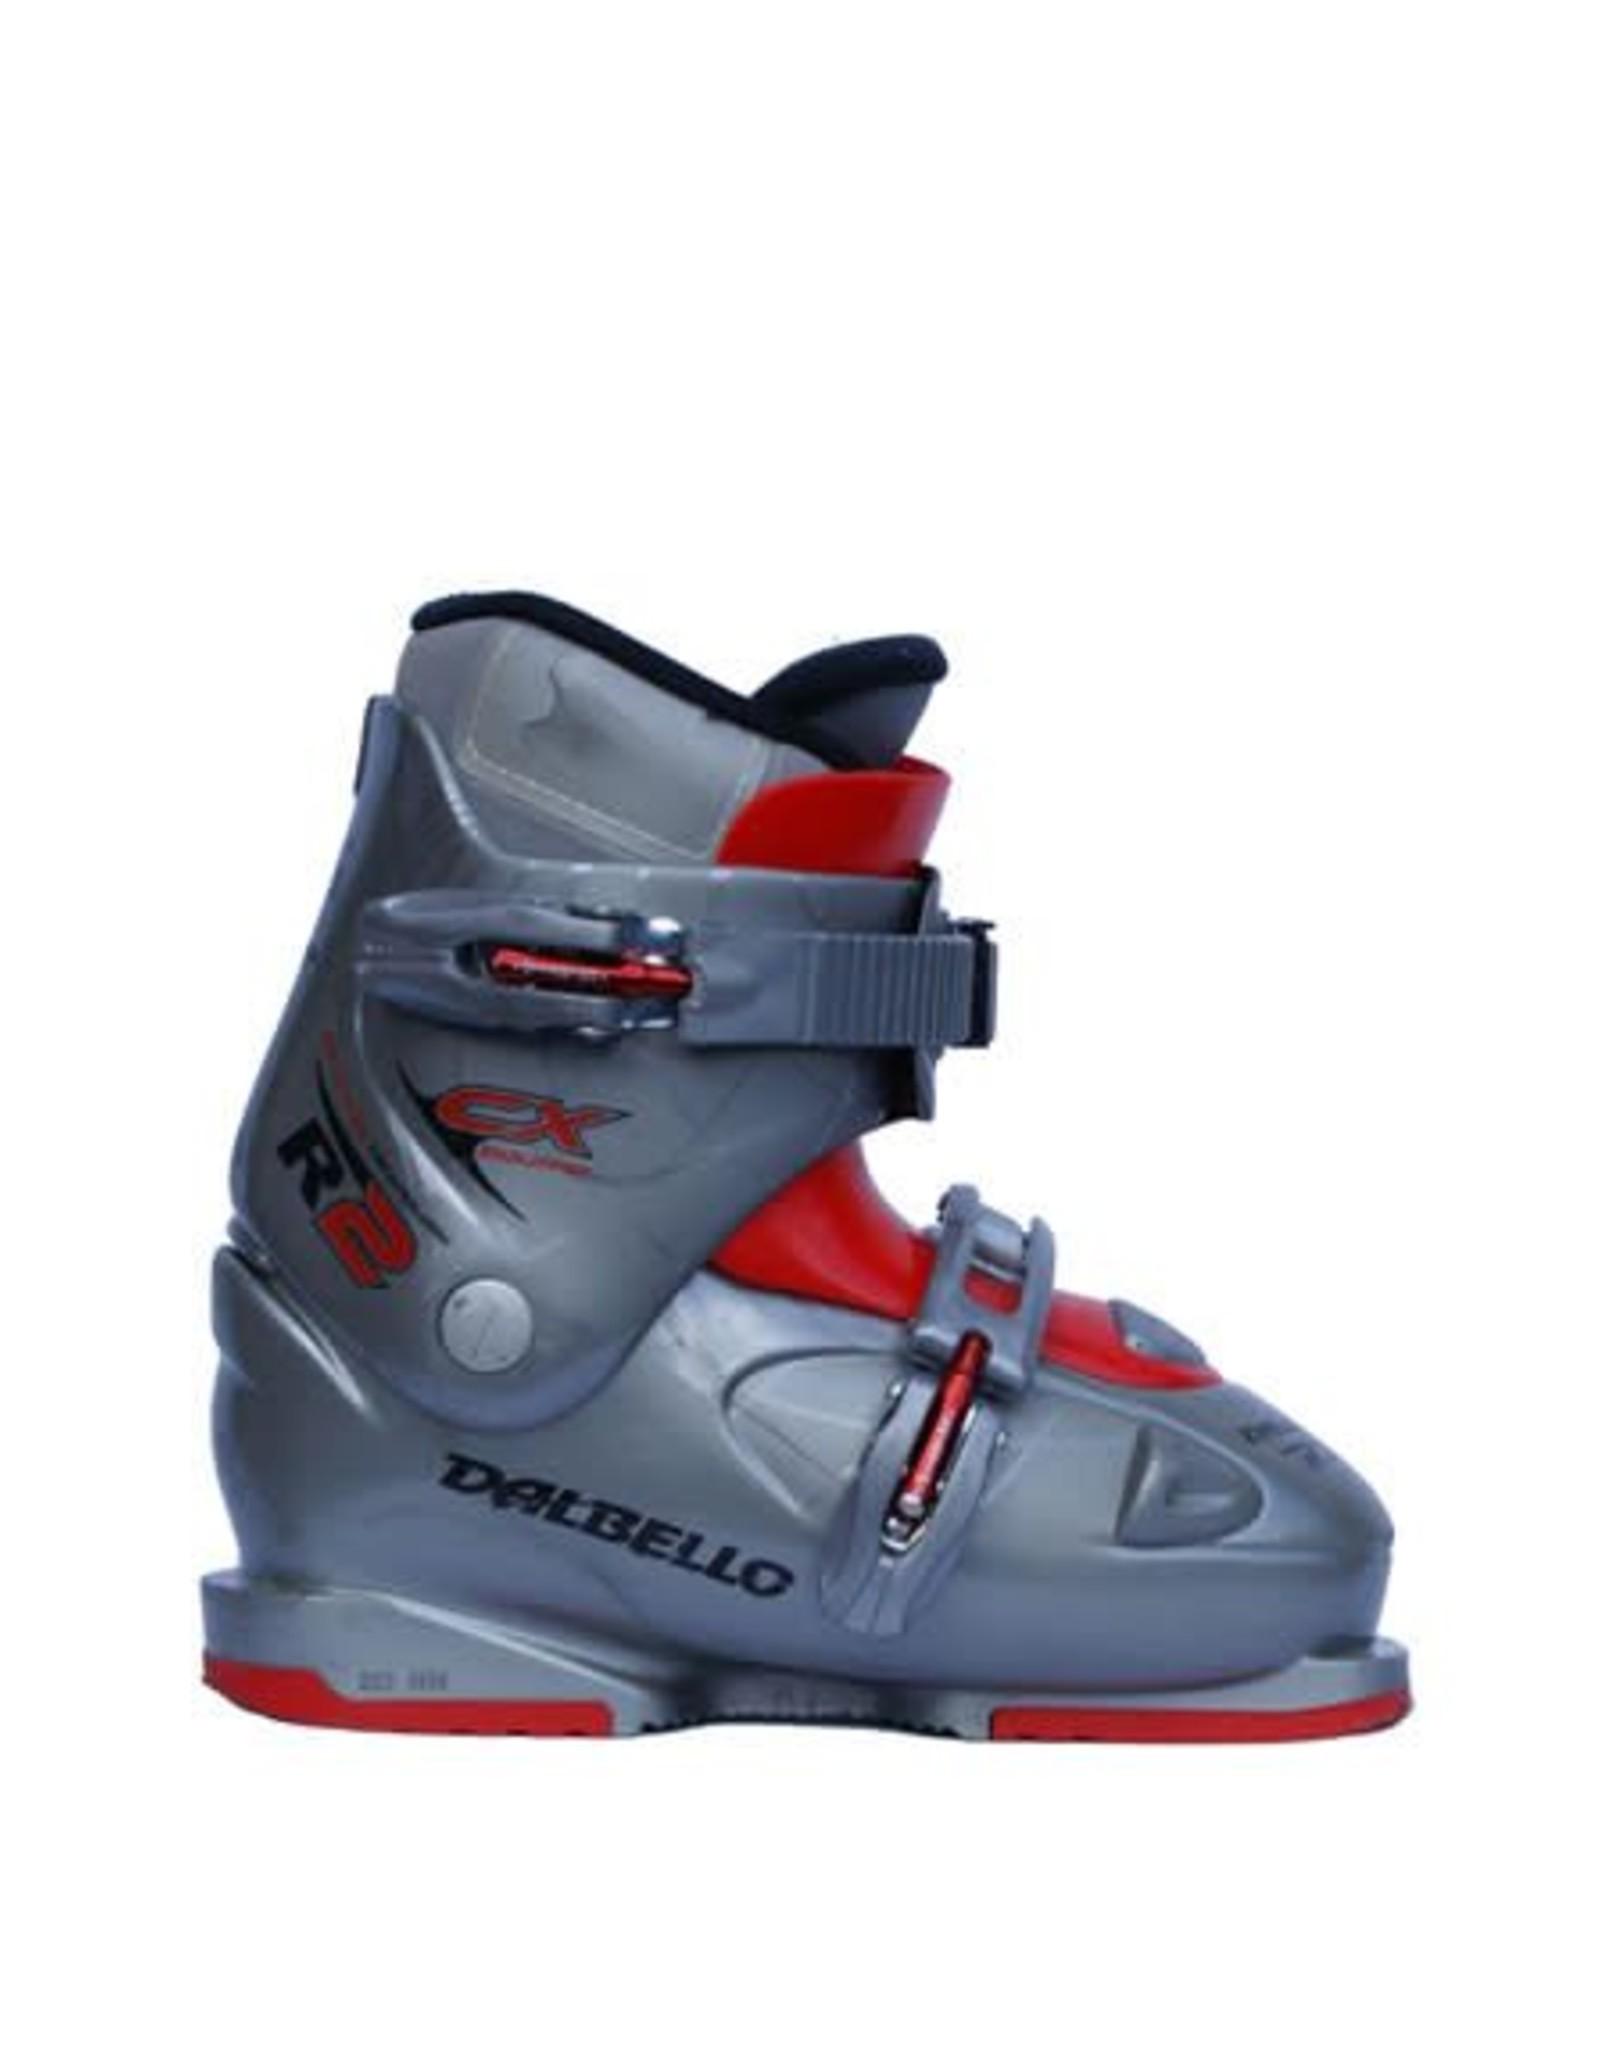 DALBELLO Skischoenen DALBELLO CX Equipe R2/R3 Gebruikt